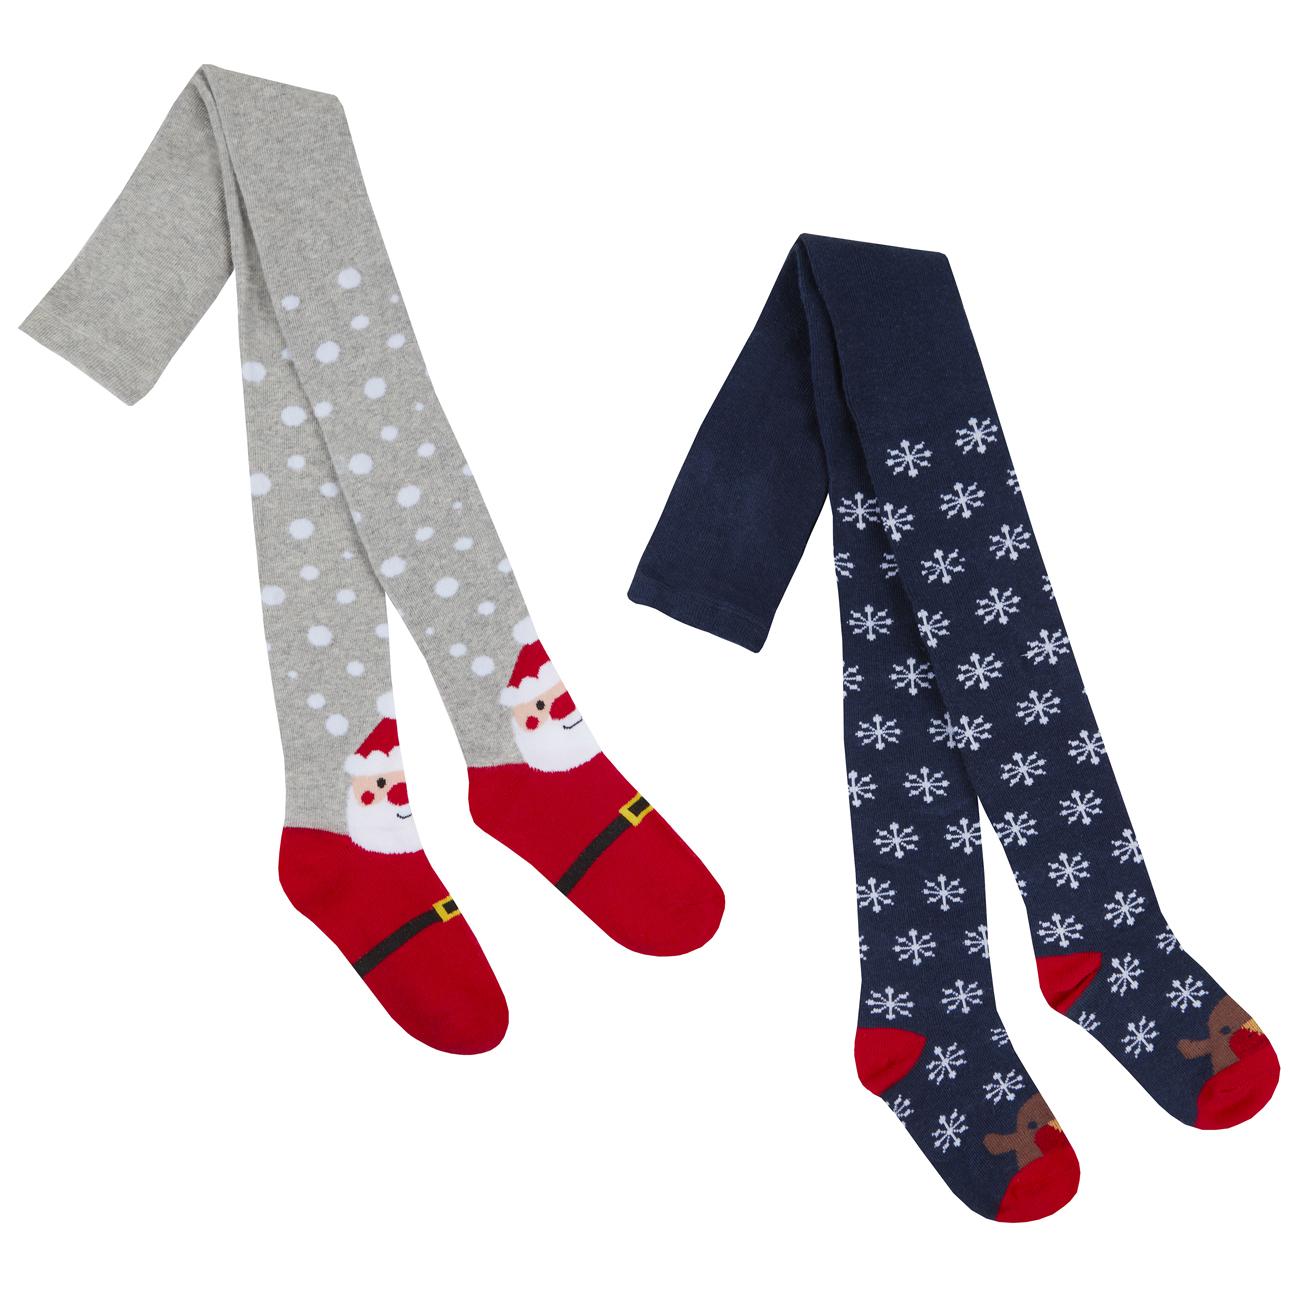 96abb8494ea Girls Christmas Tights 2-Pack Cotton Rich Xmas Novelty Snowflakes Dots 2-8  years